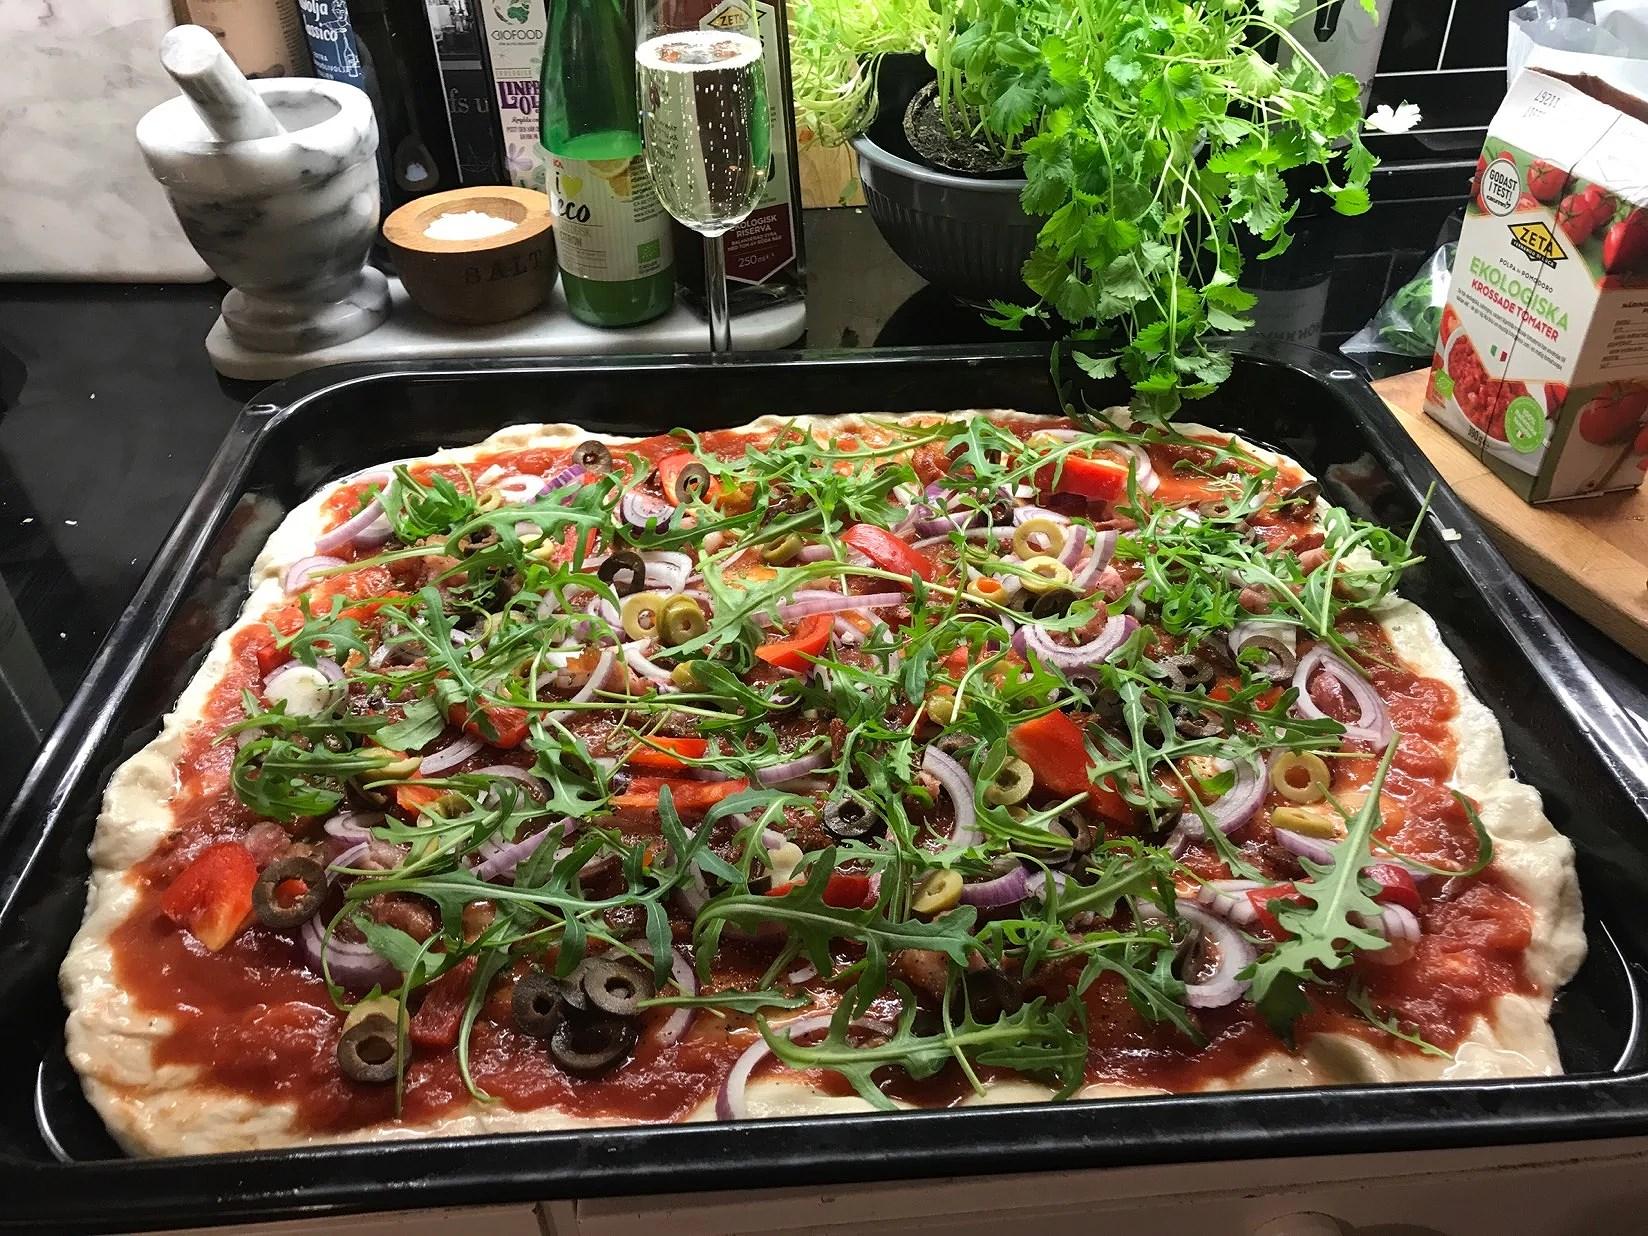 Hemlagad vego pizza 😋